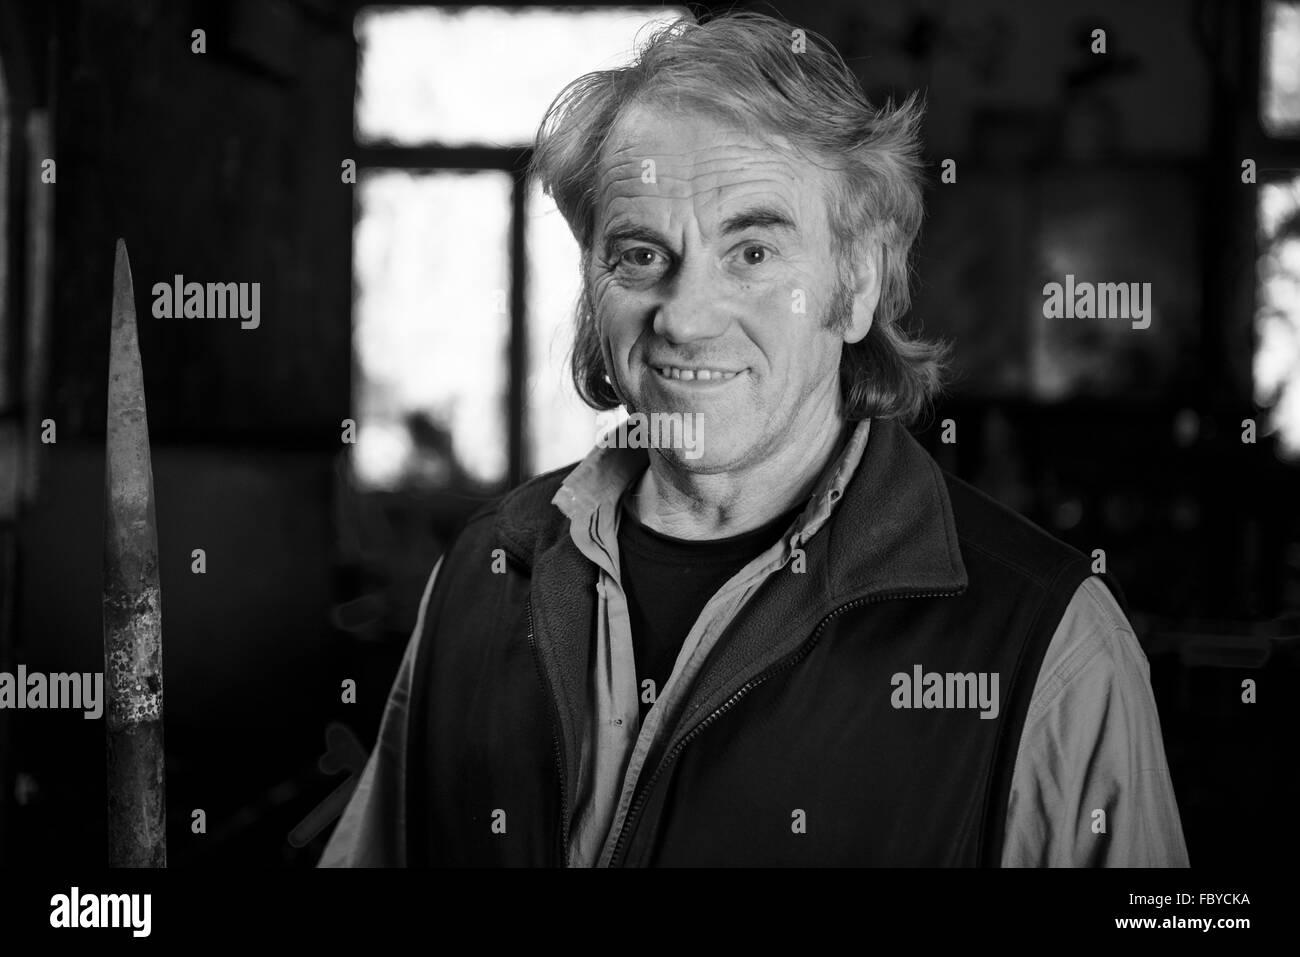 Portrait of a Blacksmith - Stock Image